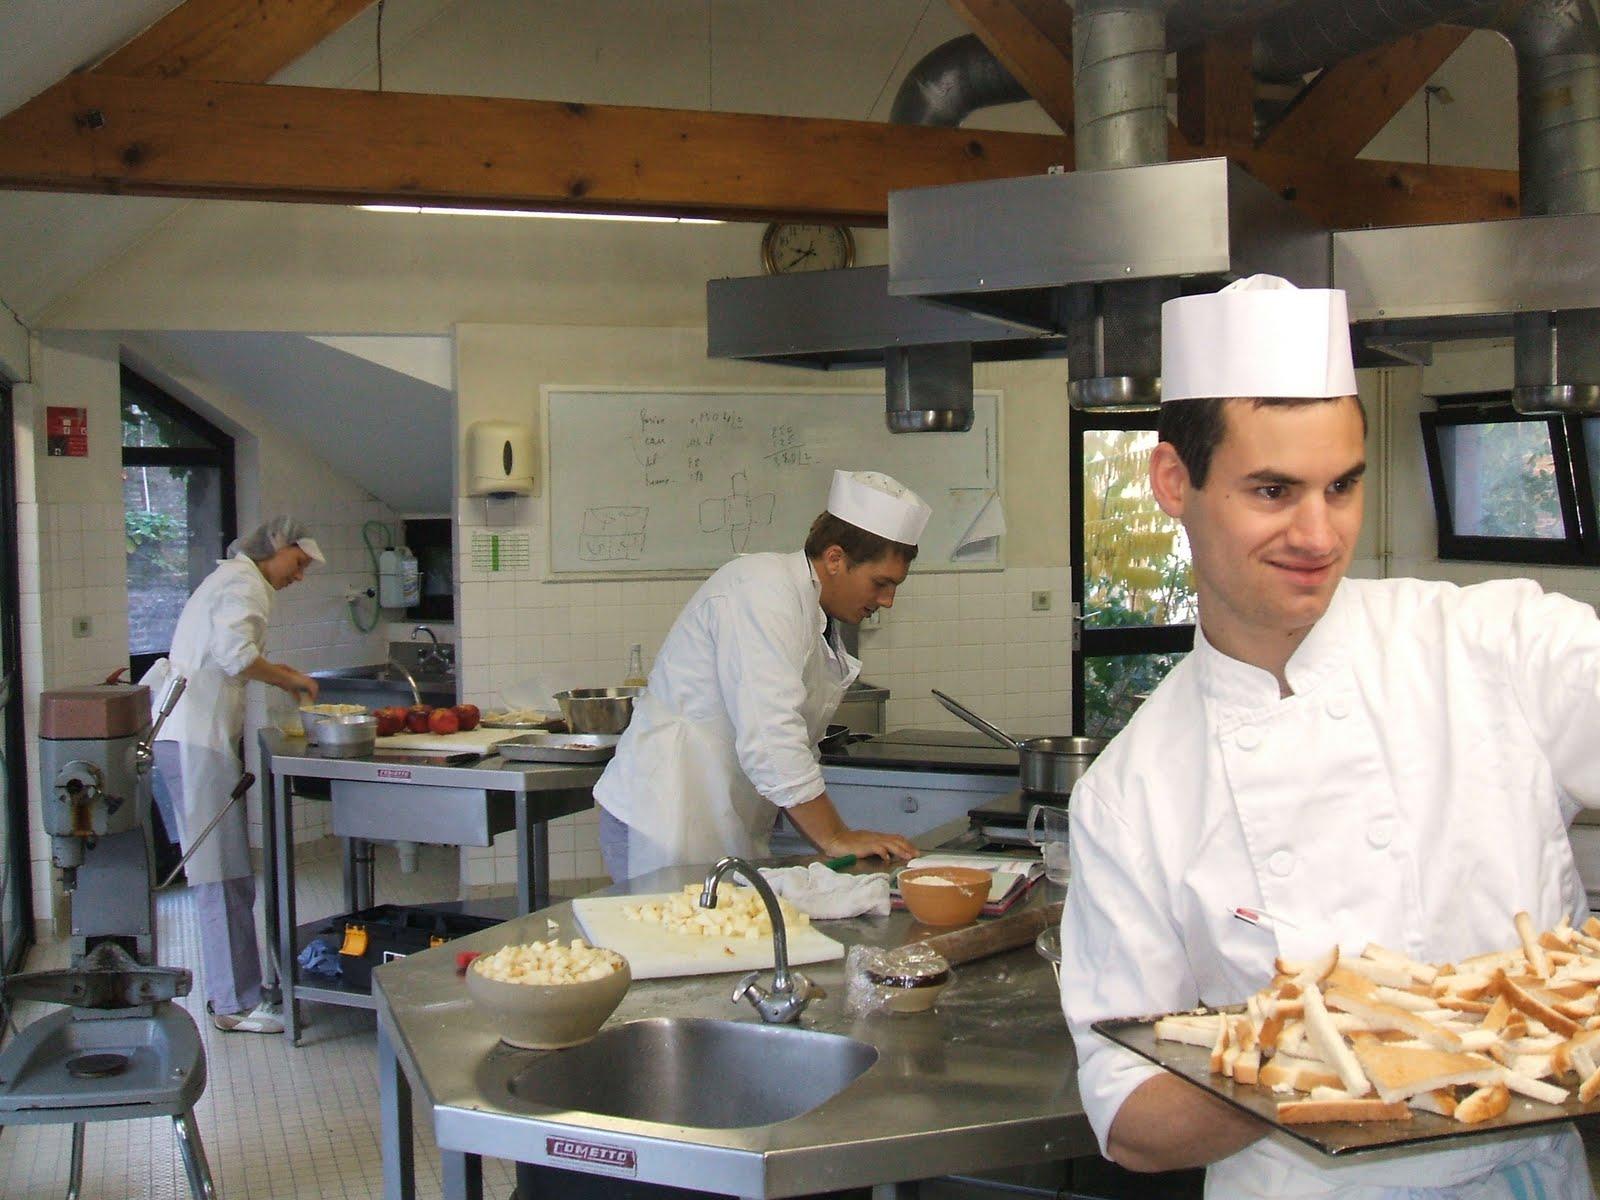 Cuisinier gestionnaire de collectivit for Cuisinier 2010